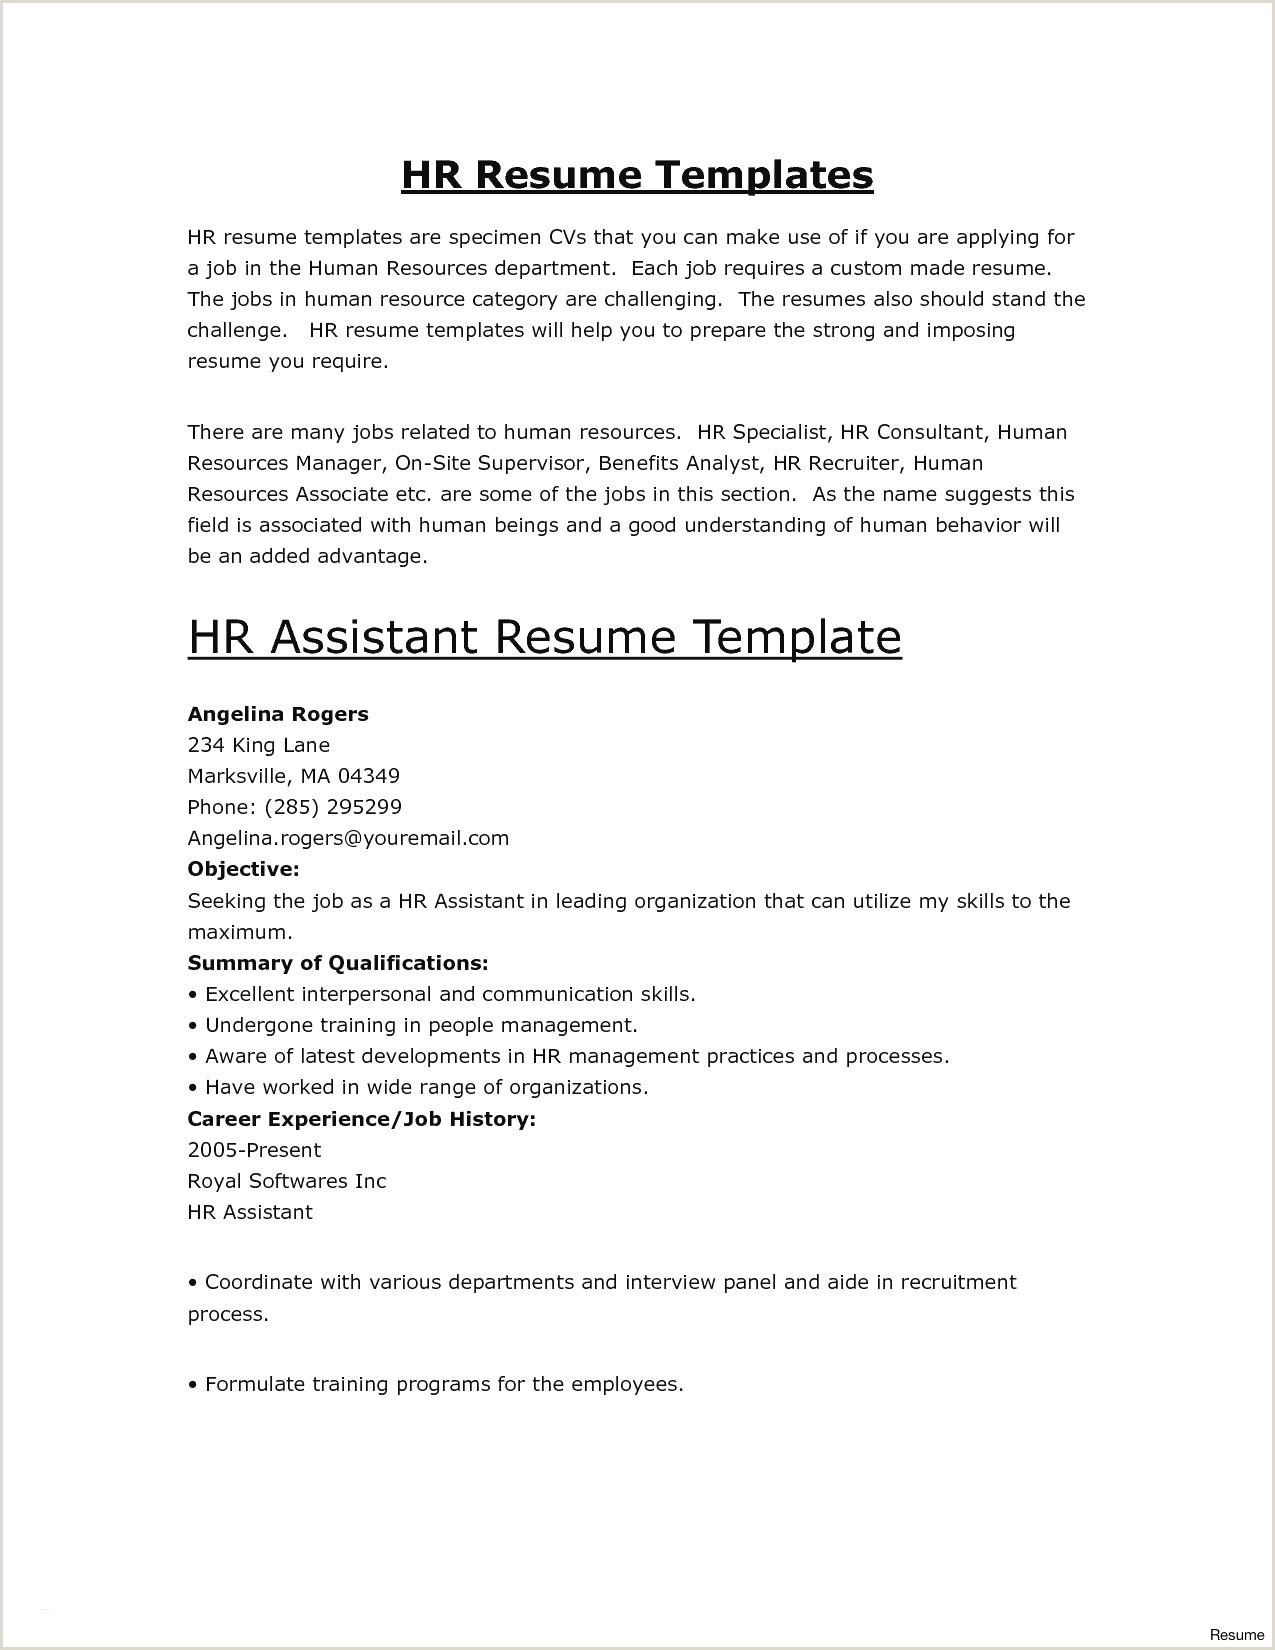 Resume format for Job Interview Pdf Free Download Elegant Free Resume Template Download Pdf